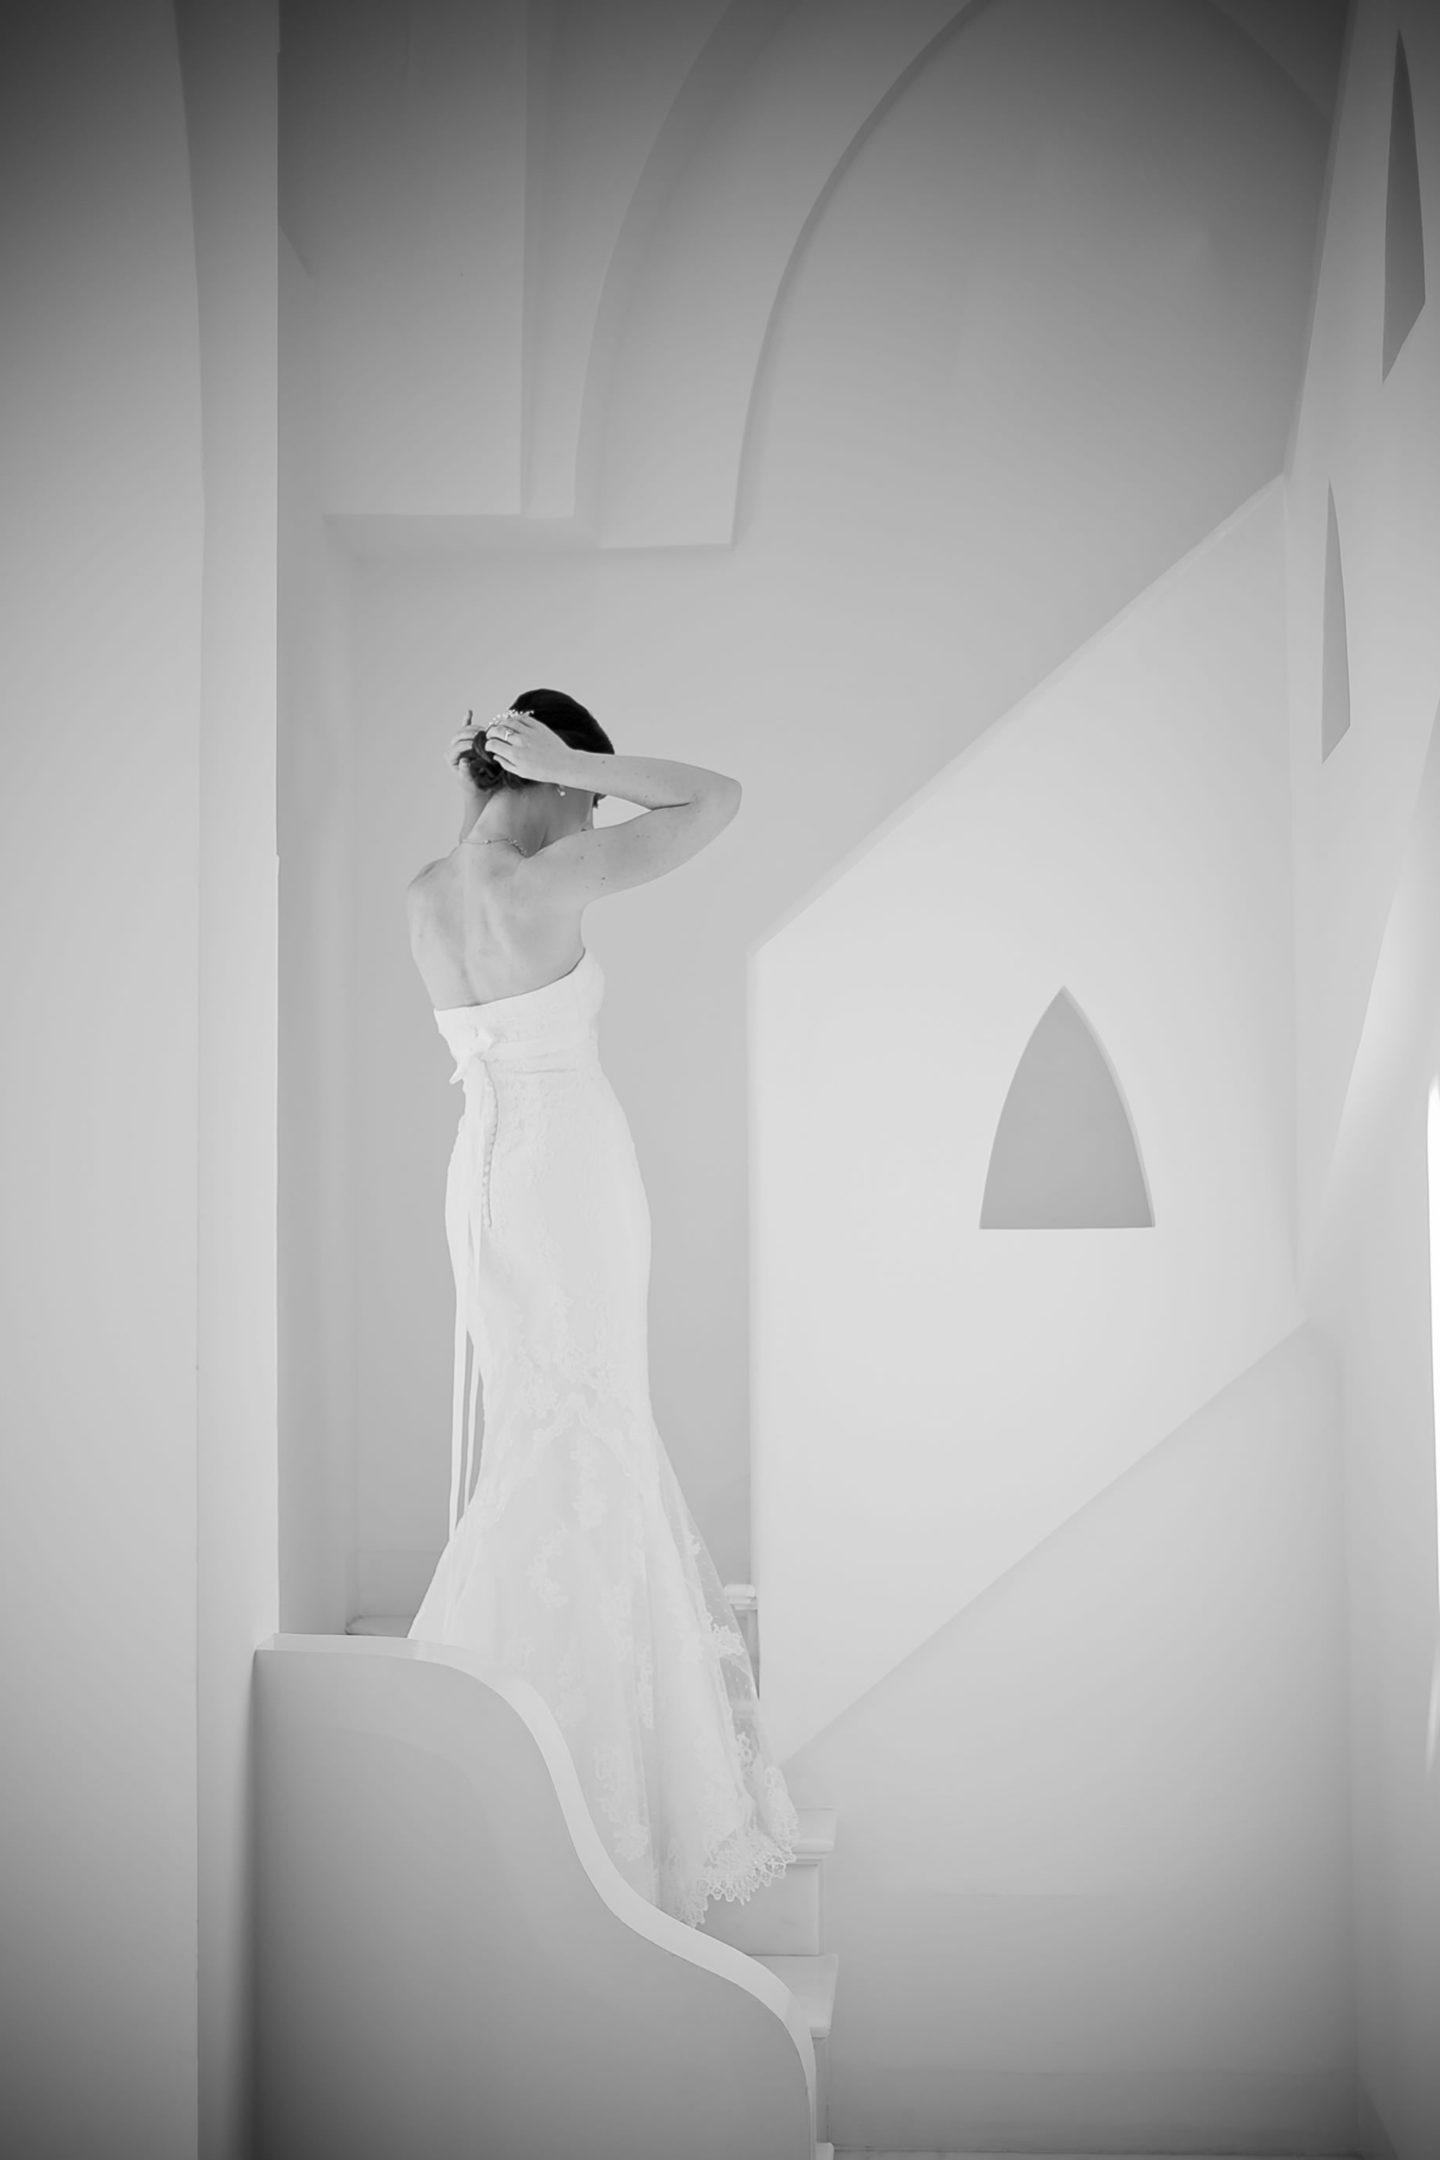 lines-david-bastianoni-photographer-00037